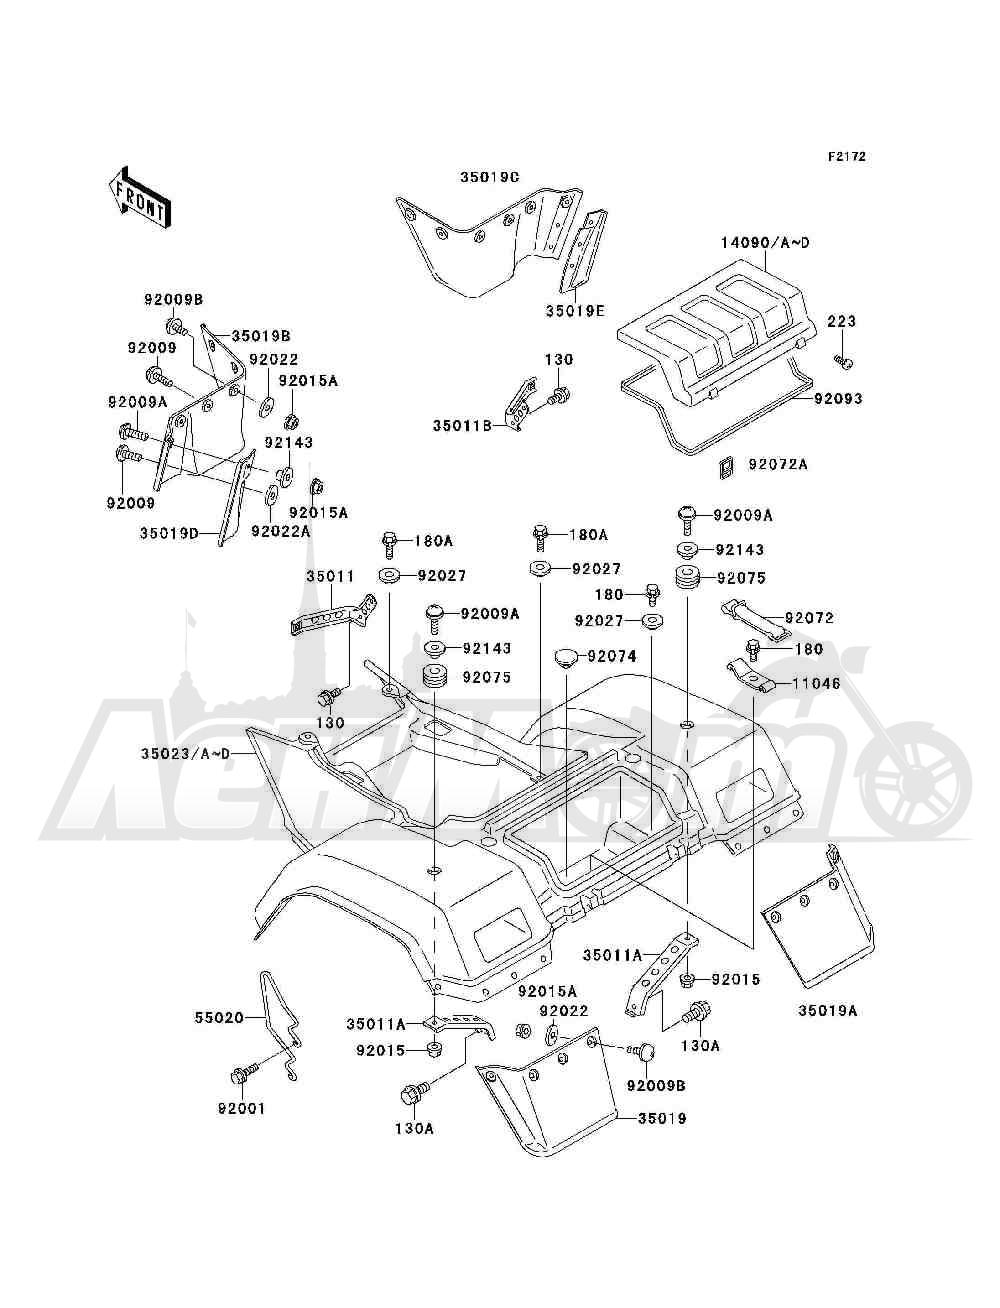 Запчасти для Квадроцикла Kawasaki 1994 BAYOU 300 4X4 (KLF300-C6) Раздел: REAR FENDER(S) | заднее крыло (S)